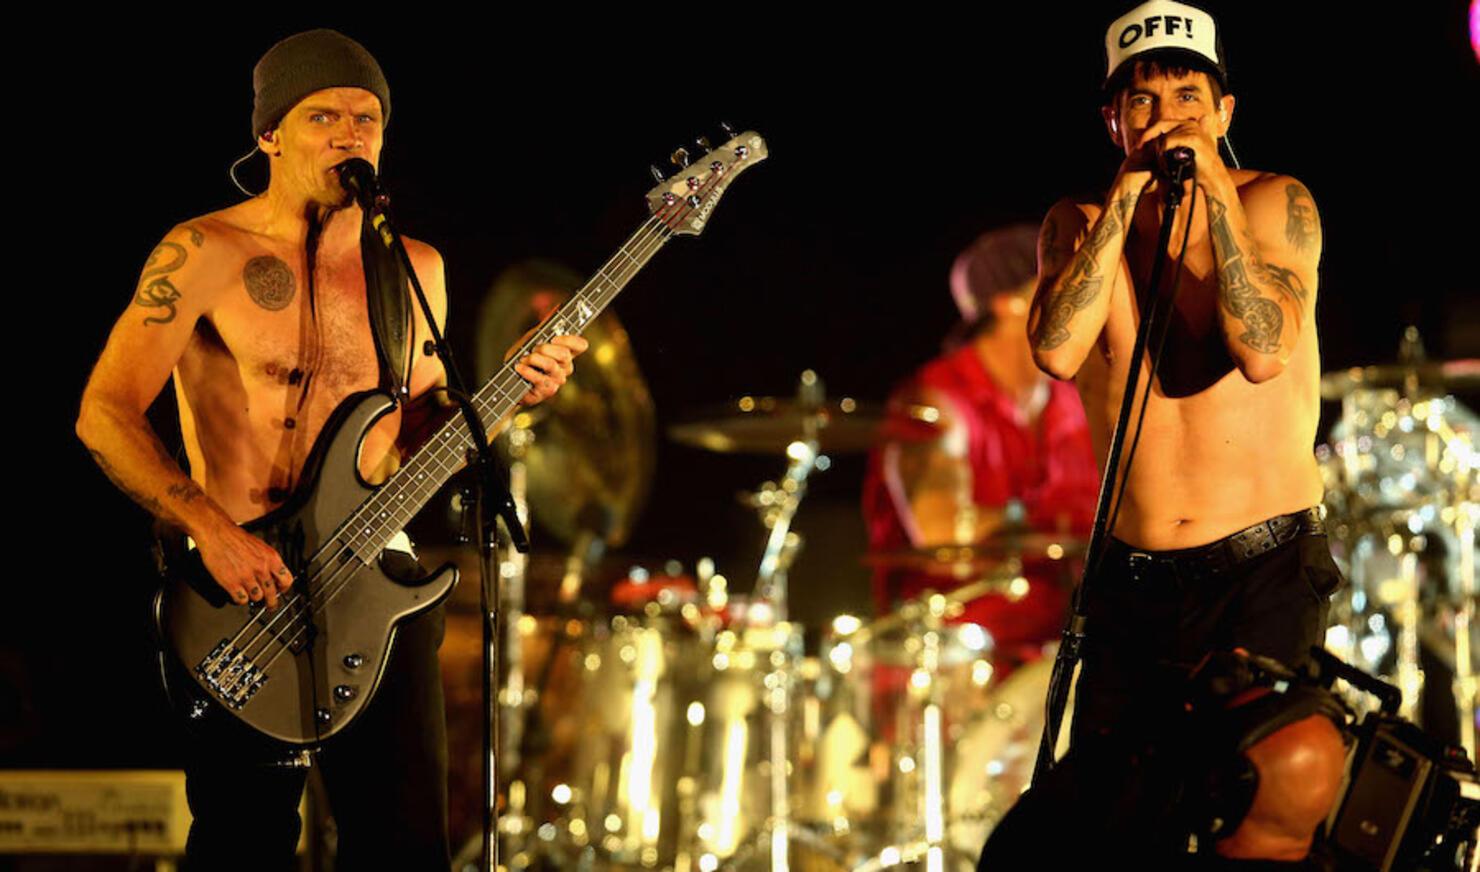 2013 Coachella Valley Music And Arts Festival ? Day 3